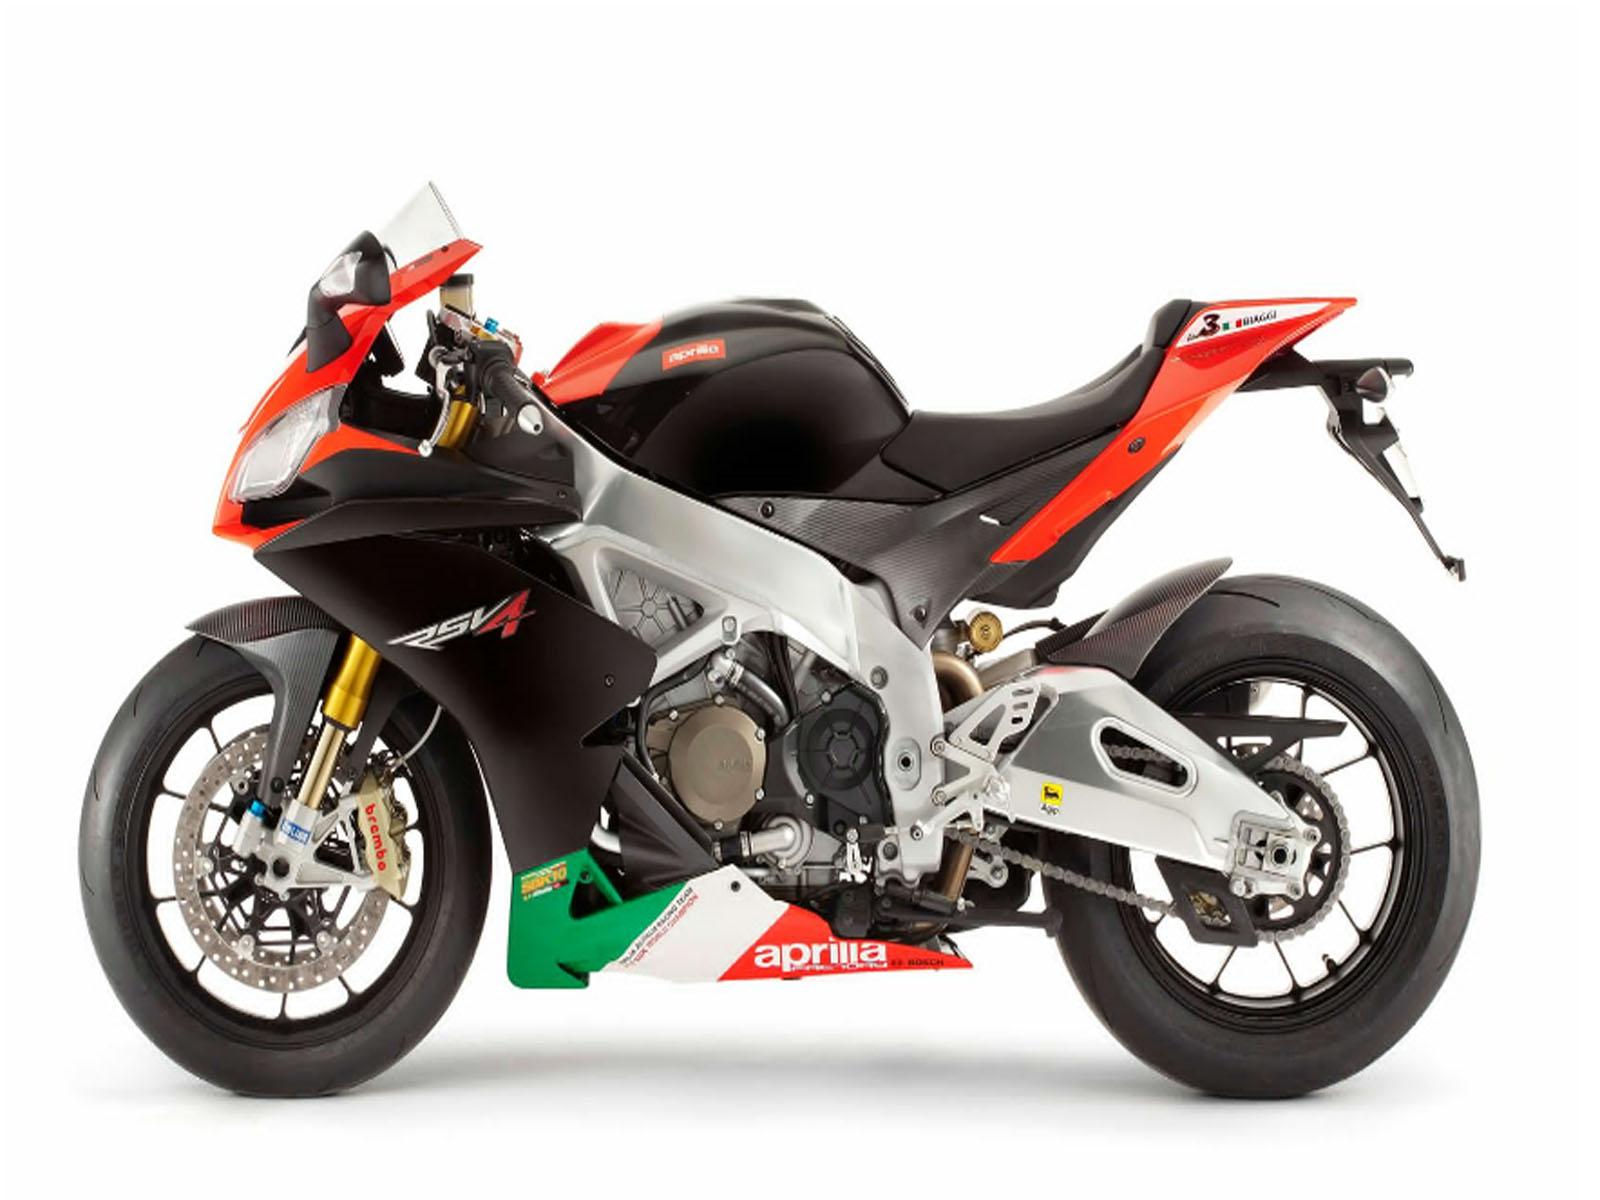 New Motorcycle 2011 Aprilia Rsv4 Factory Aprc Se